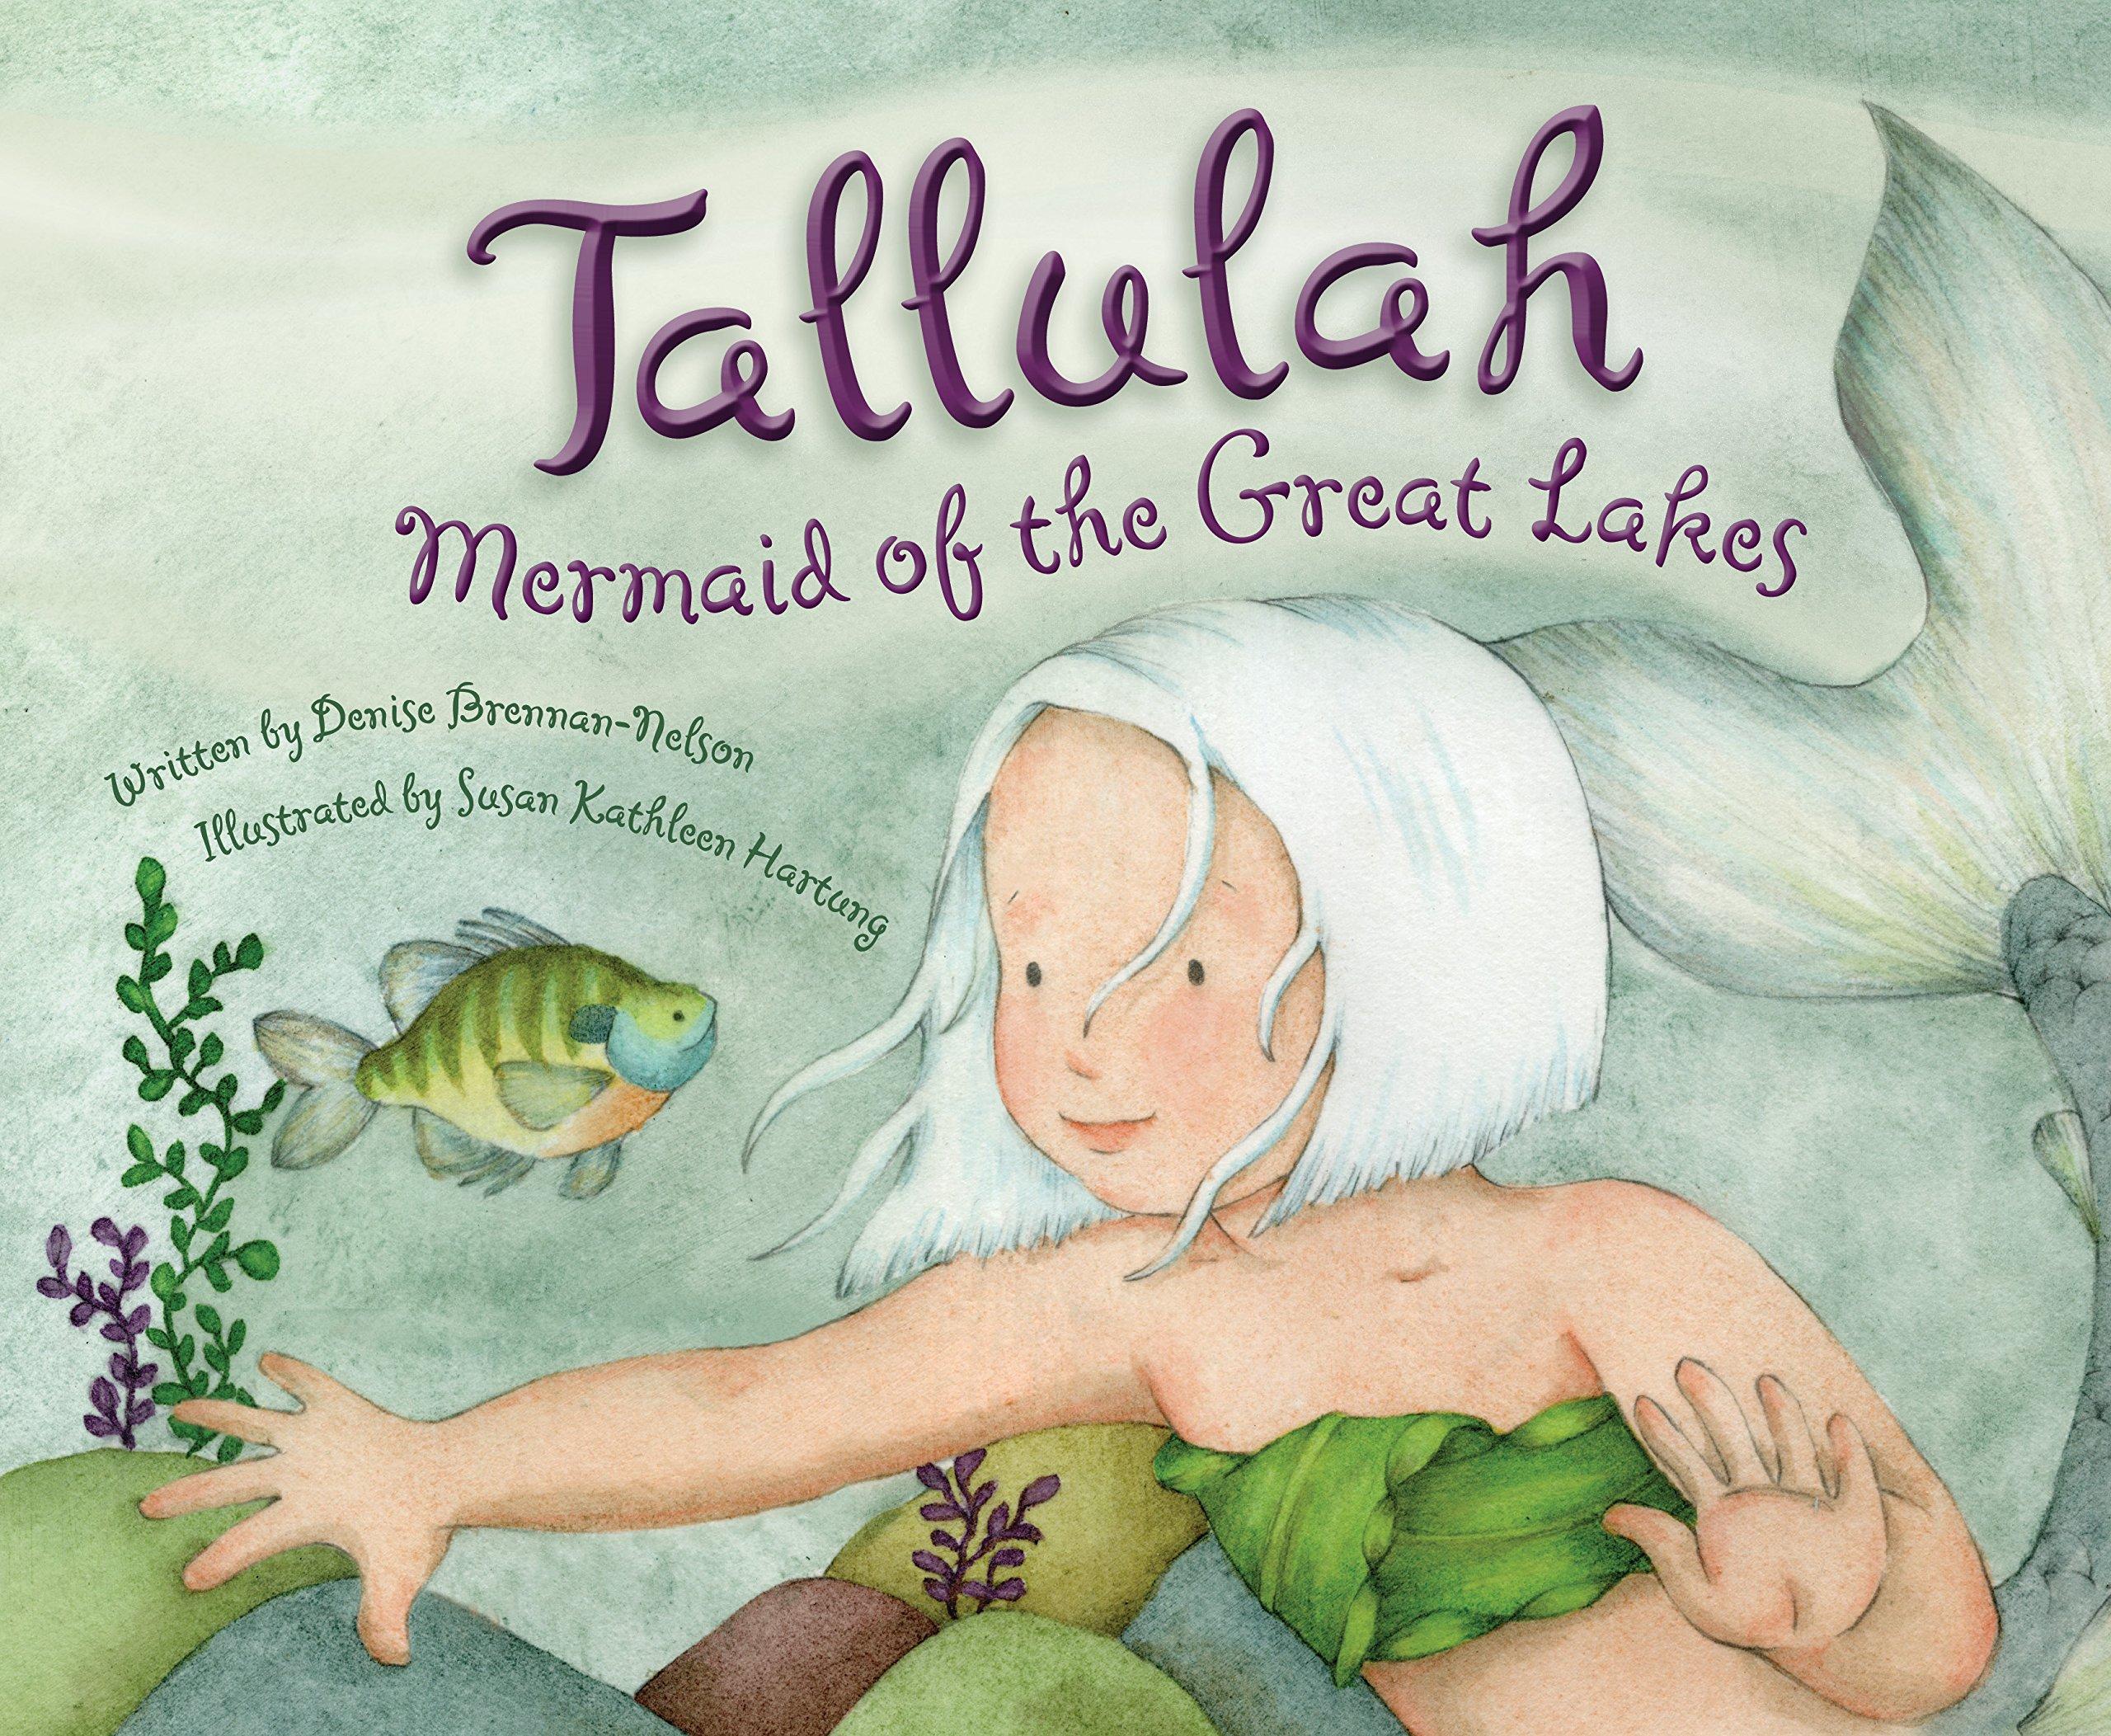 Tallulah: Mermaid Of The Great Lakes: Denise Brennannelson, Susan Kathleen  Hartung: 9781585369096: Amazon: Books